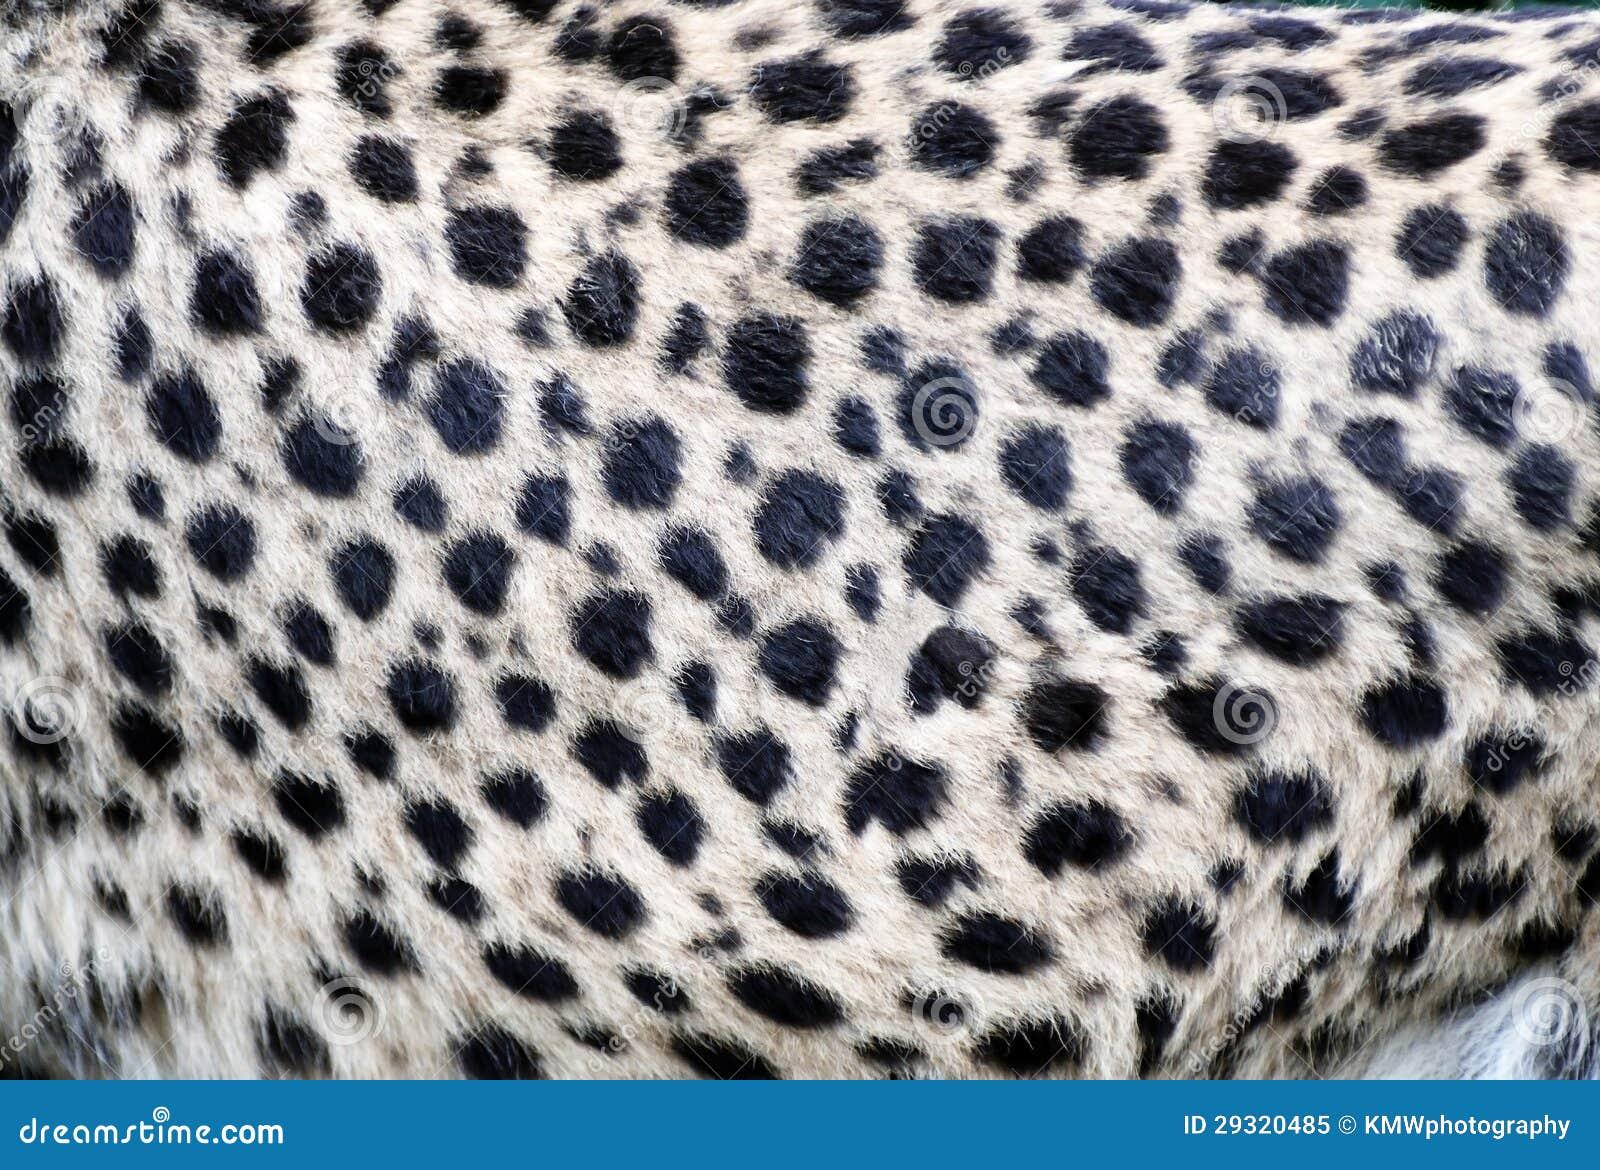 Cheetah Fur Close Up Cheetah Fur Clo...